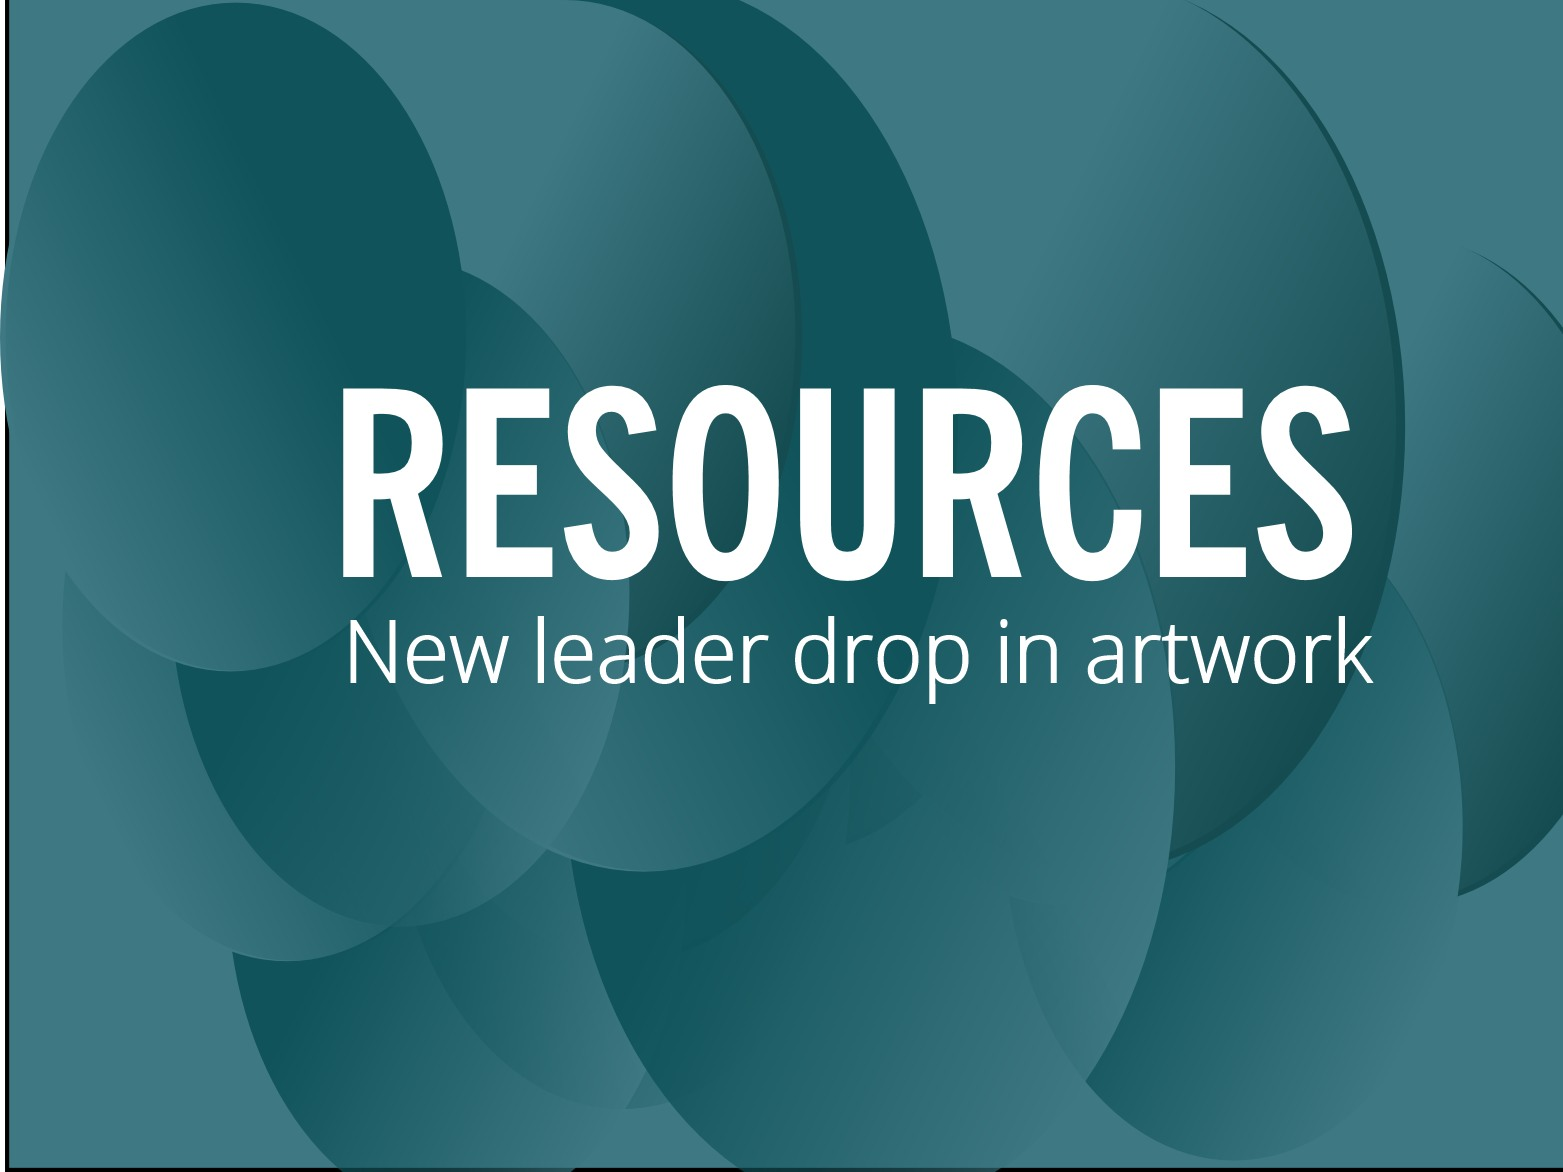 RESOURCES: New leader drop-in artwork